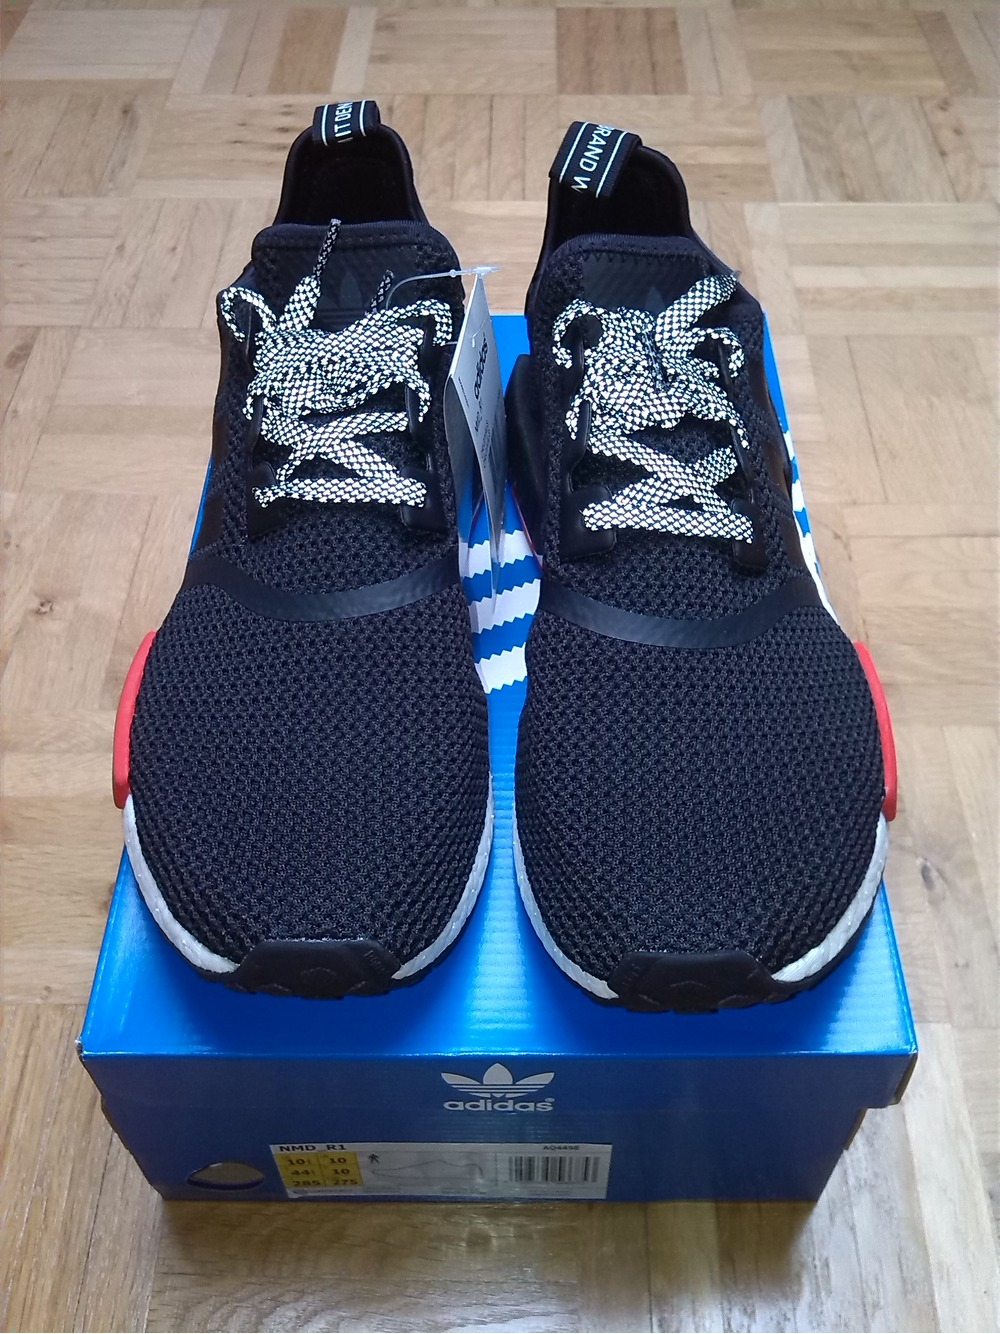 e2628dfc1dfef Adidas Nmd Runner Footlocker kenmore-cleaning.co.uk